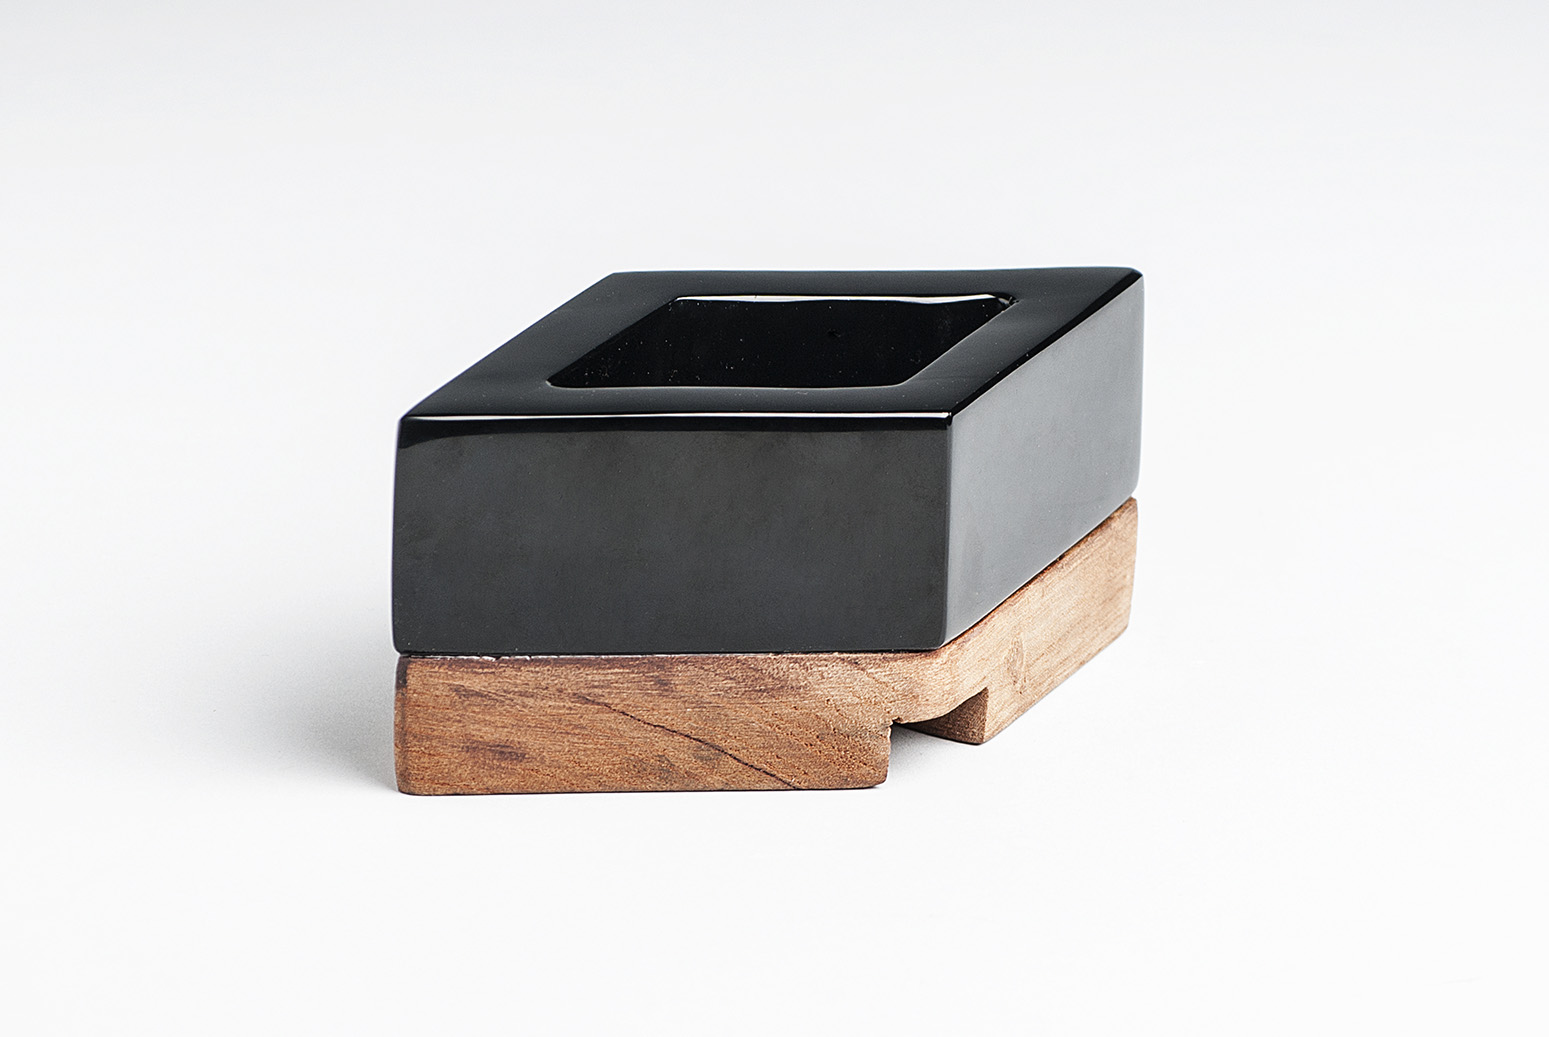 Obsidian-wood-desk-utensil-Elsa Cabrera-artisan-Mario Sandoval.-Anahuac-MarionFriedmann-MexicoDesignTime14.jpg